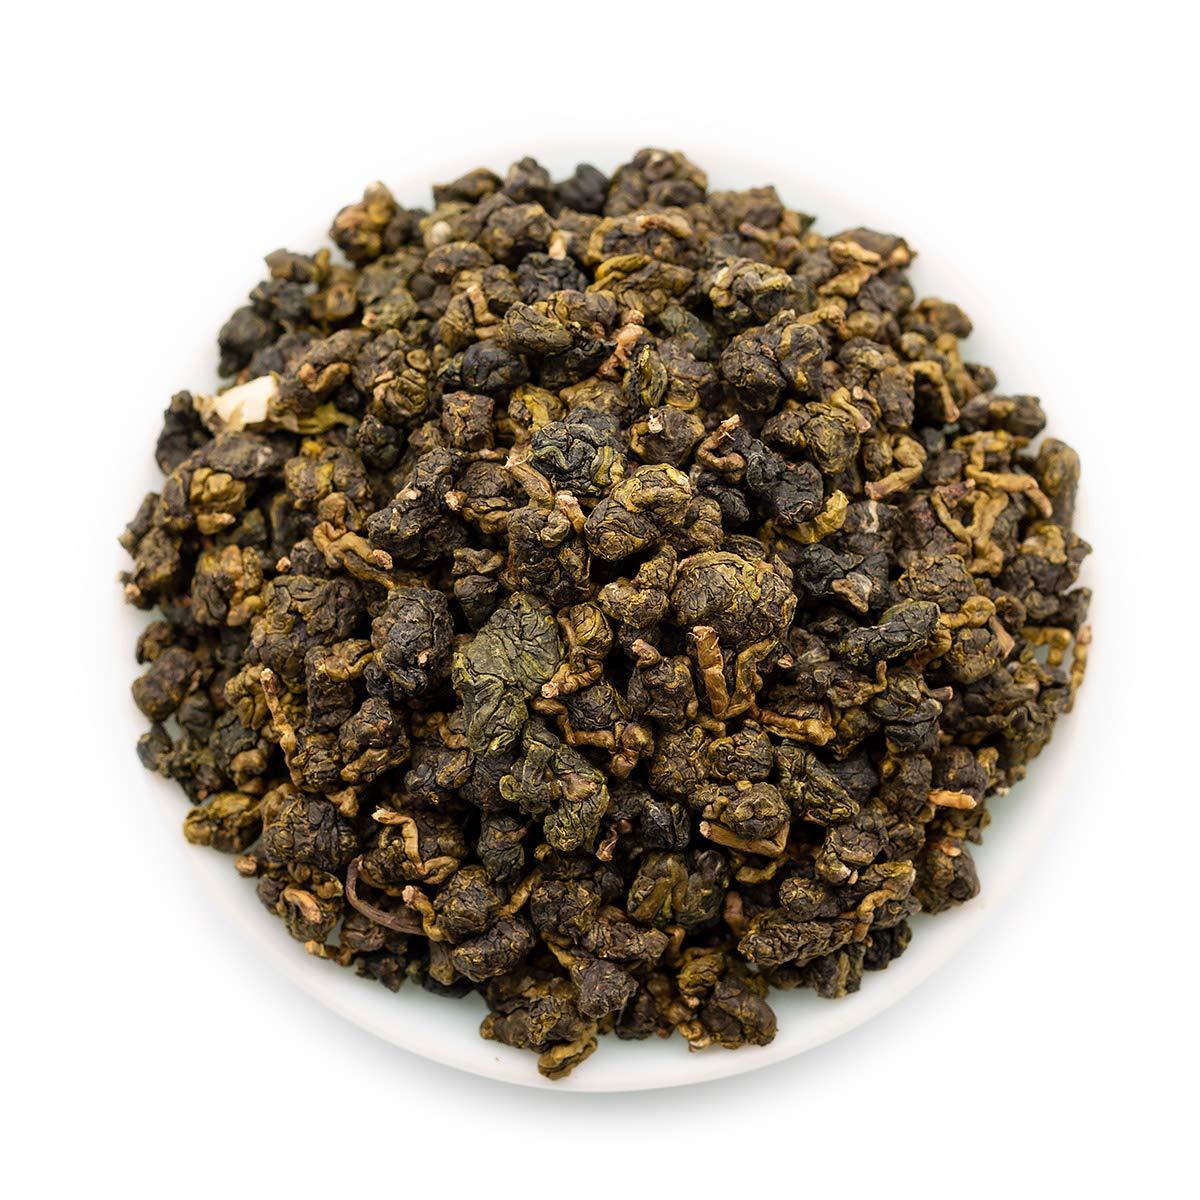 Oriarm Oolong Jasmine Tea Leaves - Taiwan High Mountain Oolong Tea Loose Leaf - Naturally Processed